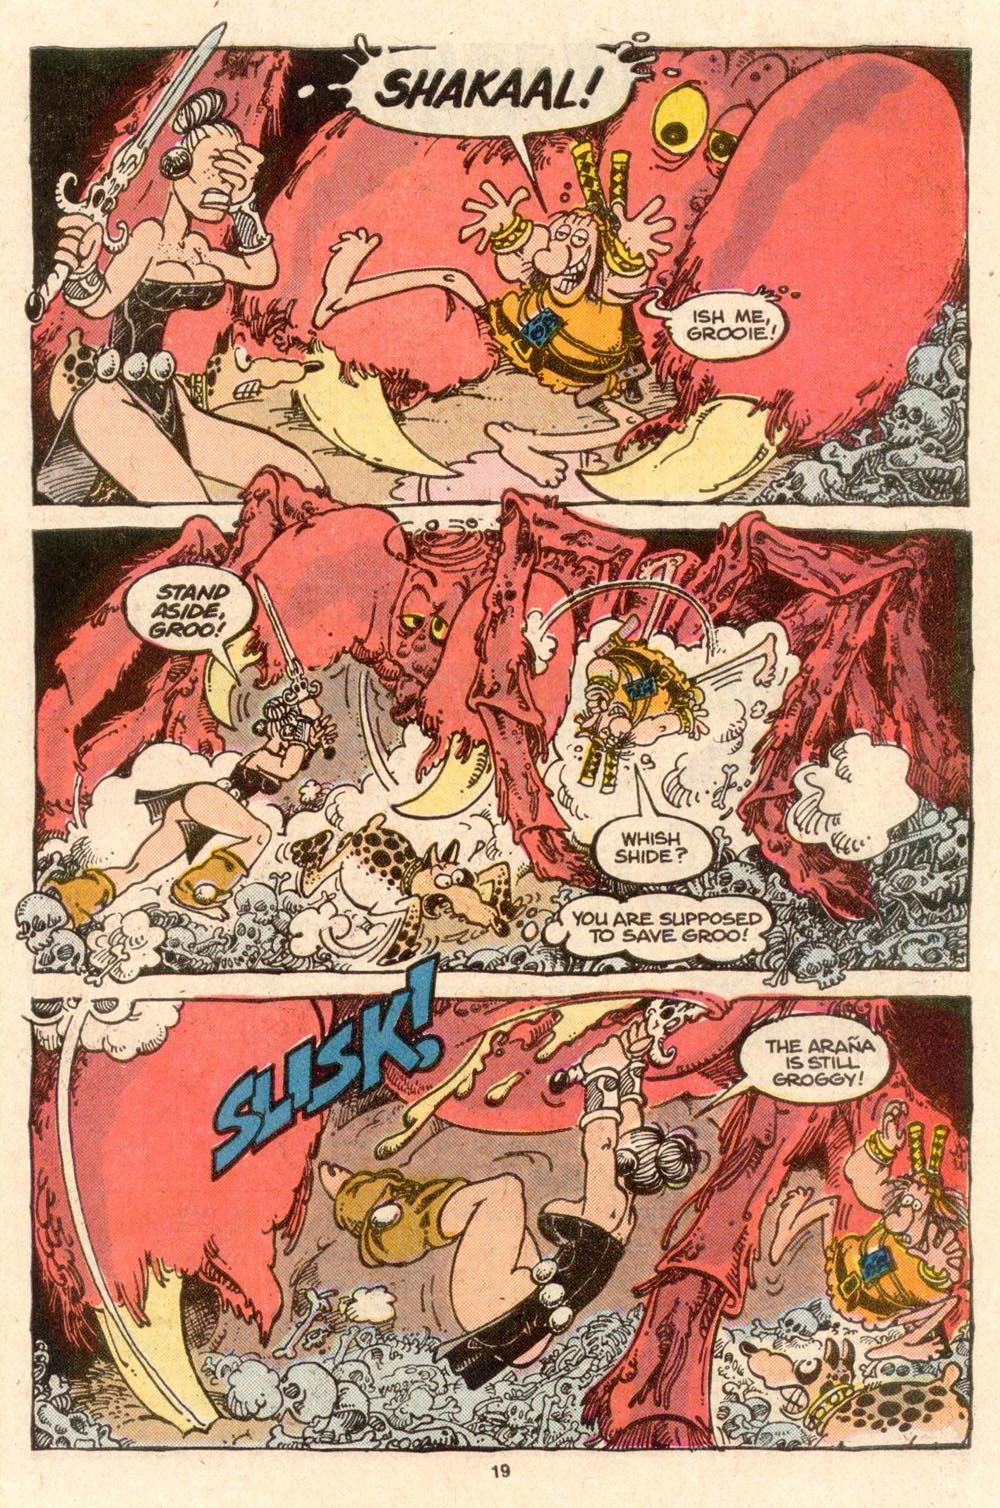 Read online Sergio Aragonés Groo the Wanderer comic -  Issue #52 - 19